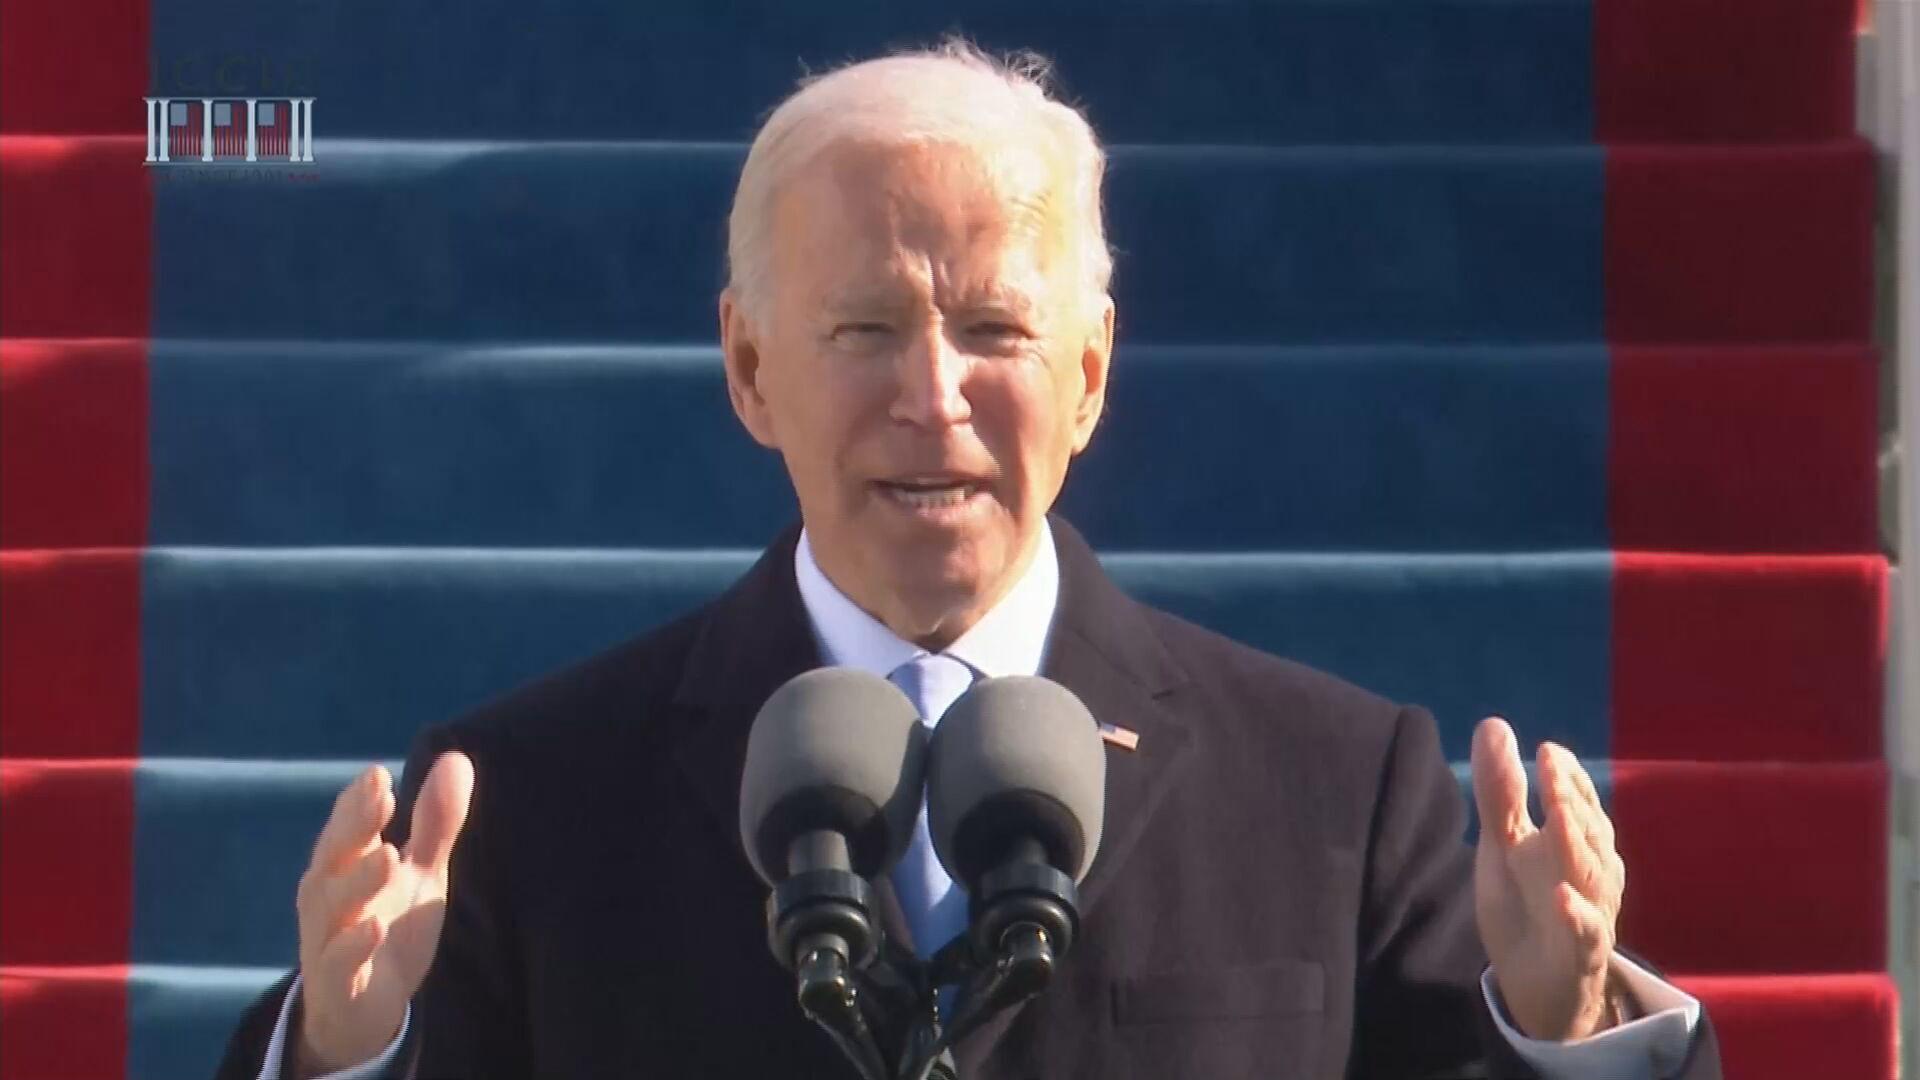 Joe Biden durante discurso de posse